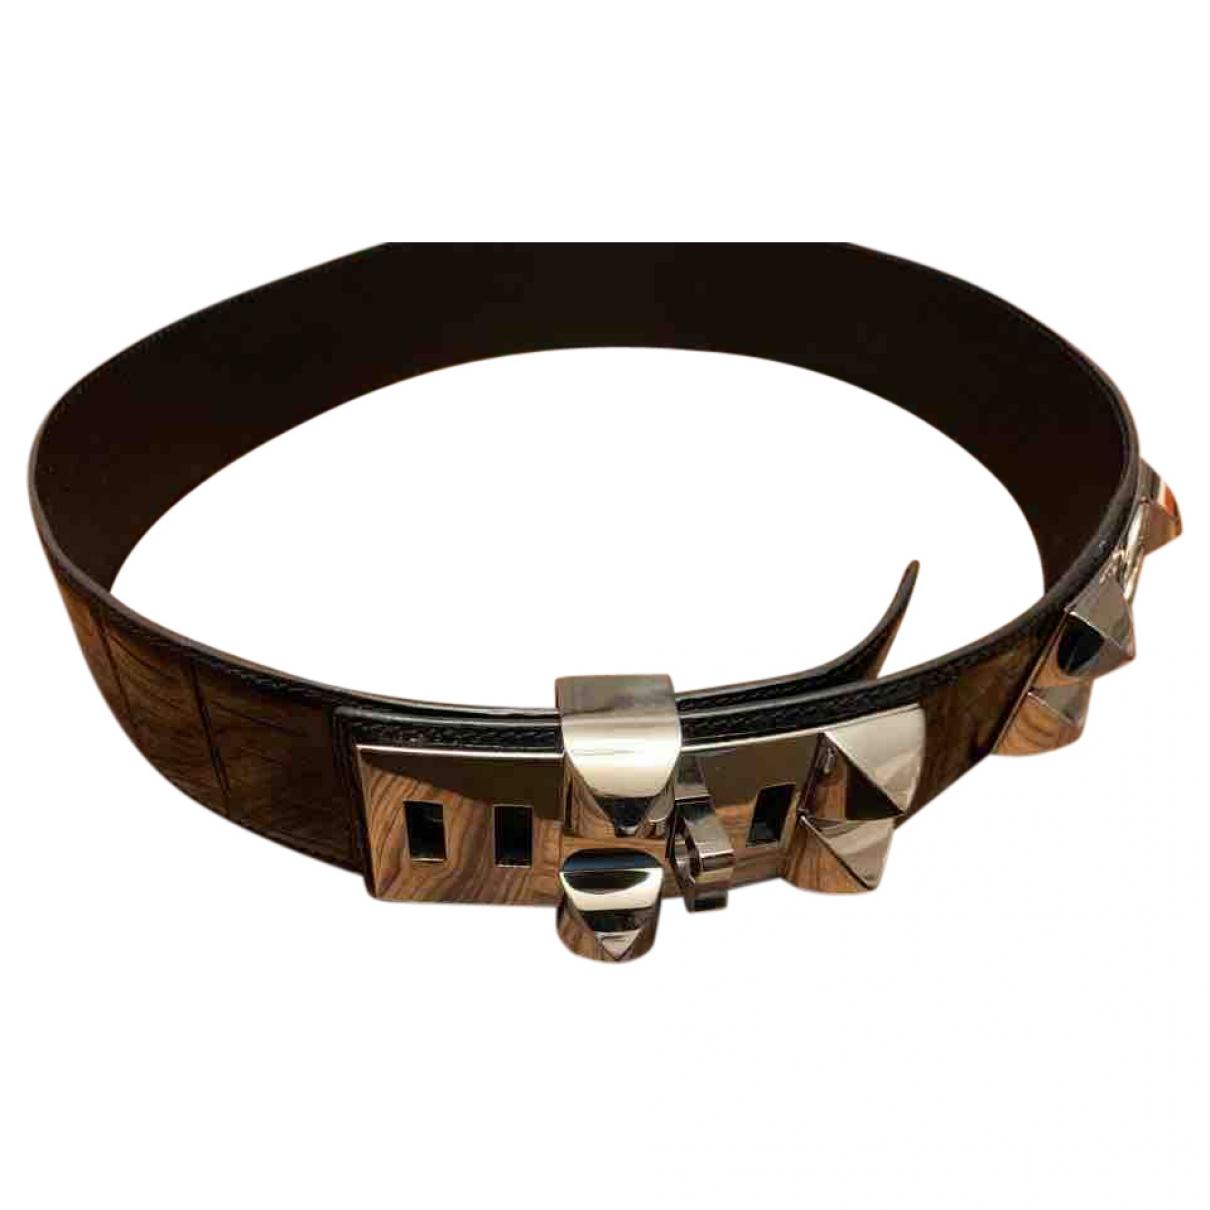 Cinturon Collier de chien de Aligator Hermes